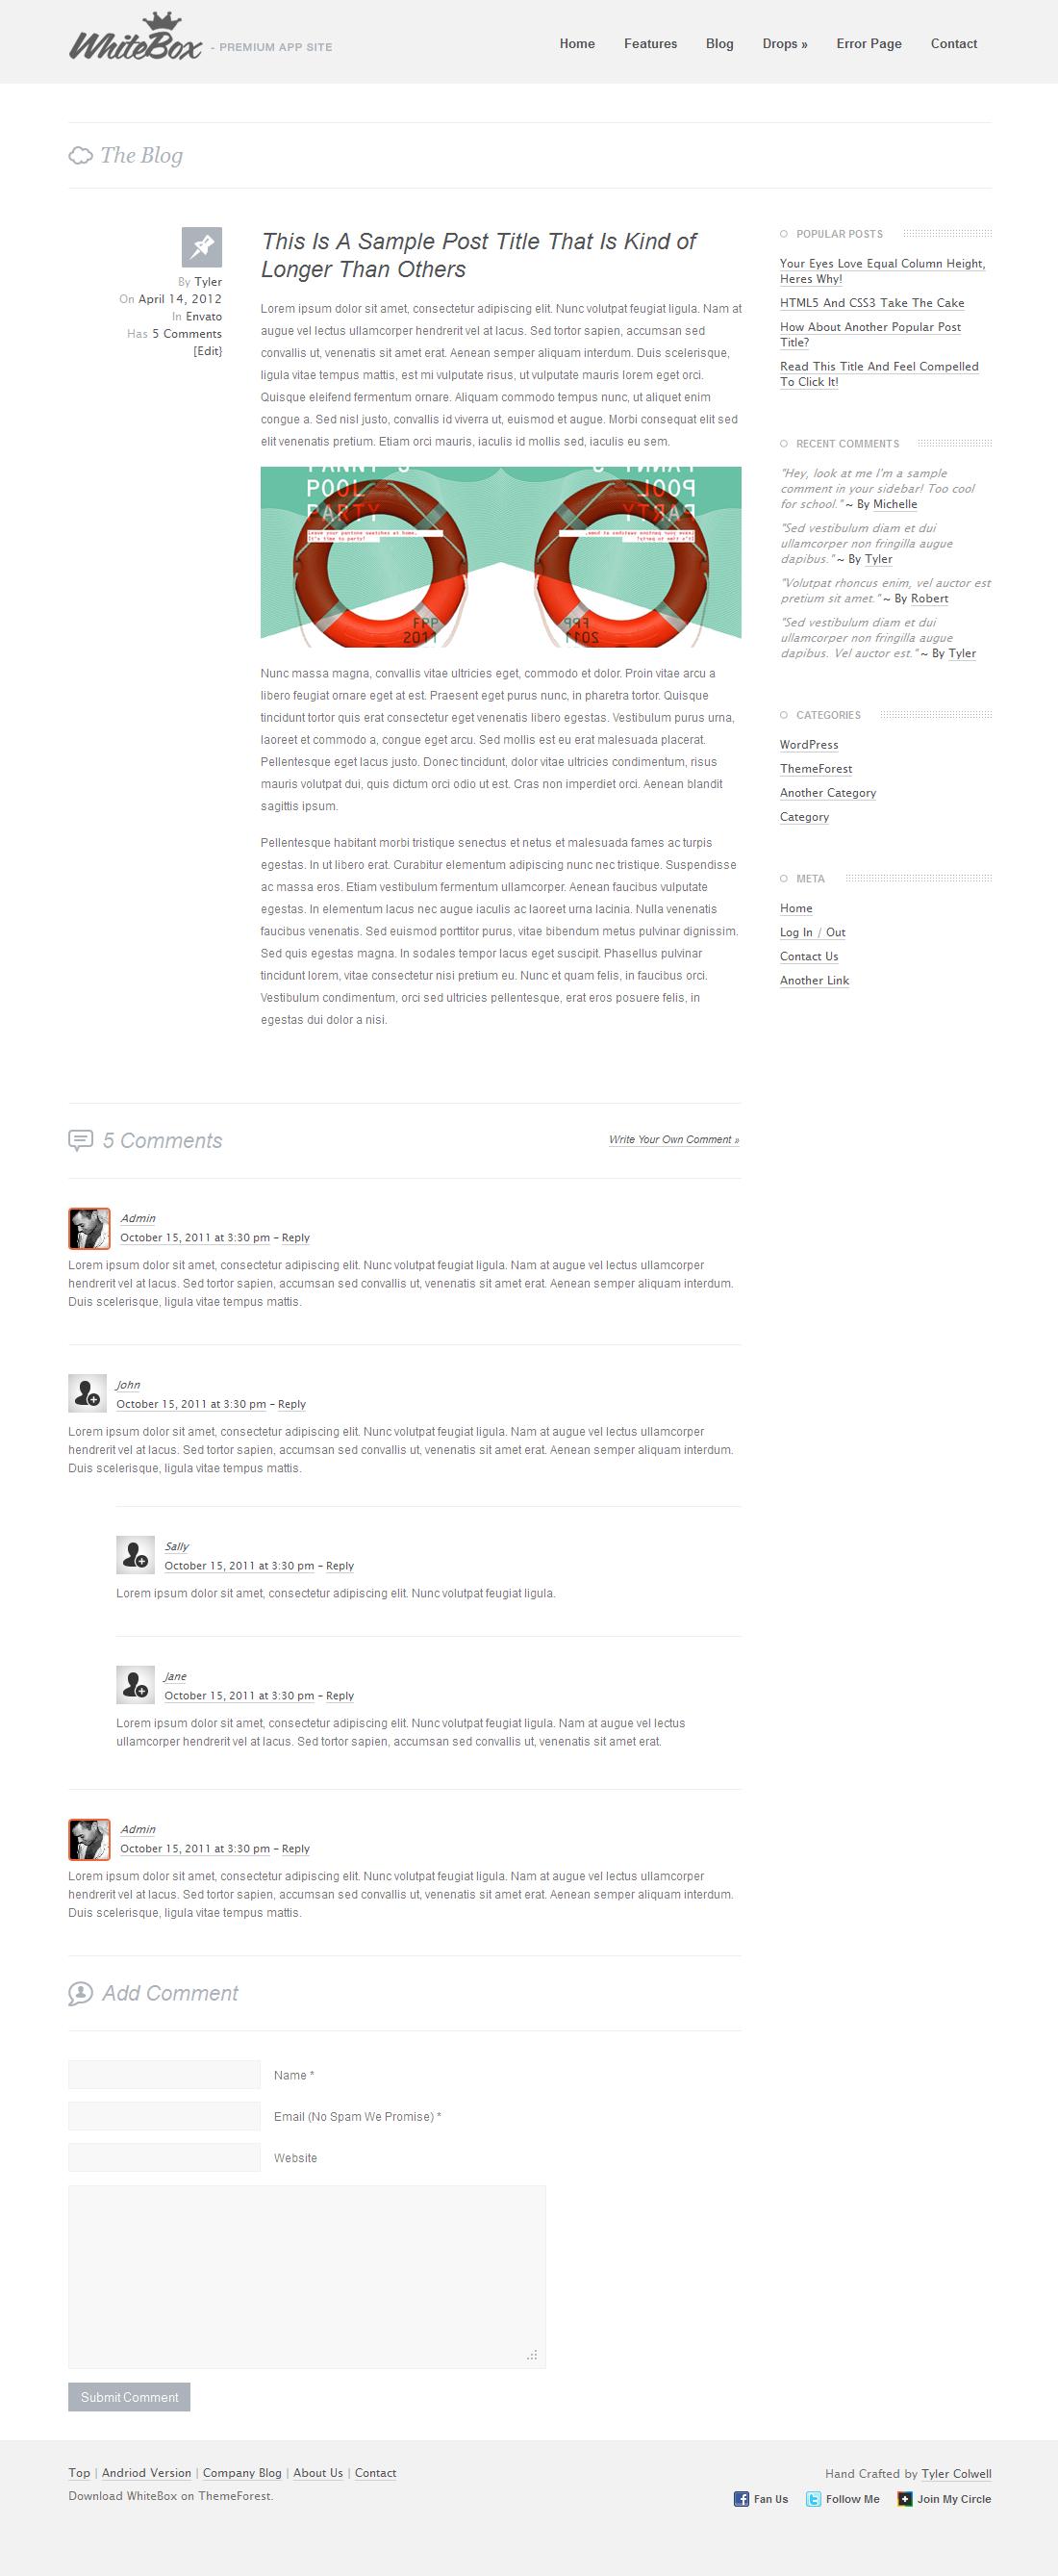 WhiteBox Premium App Website Template